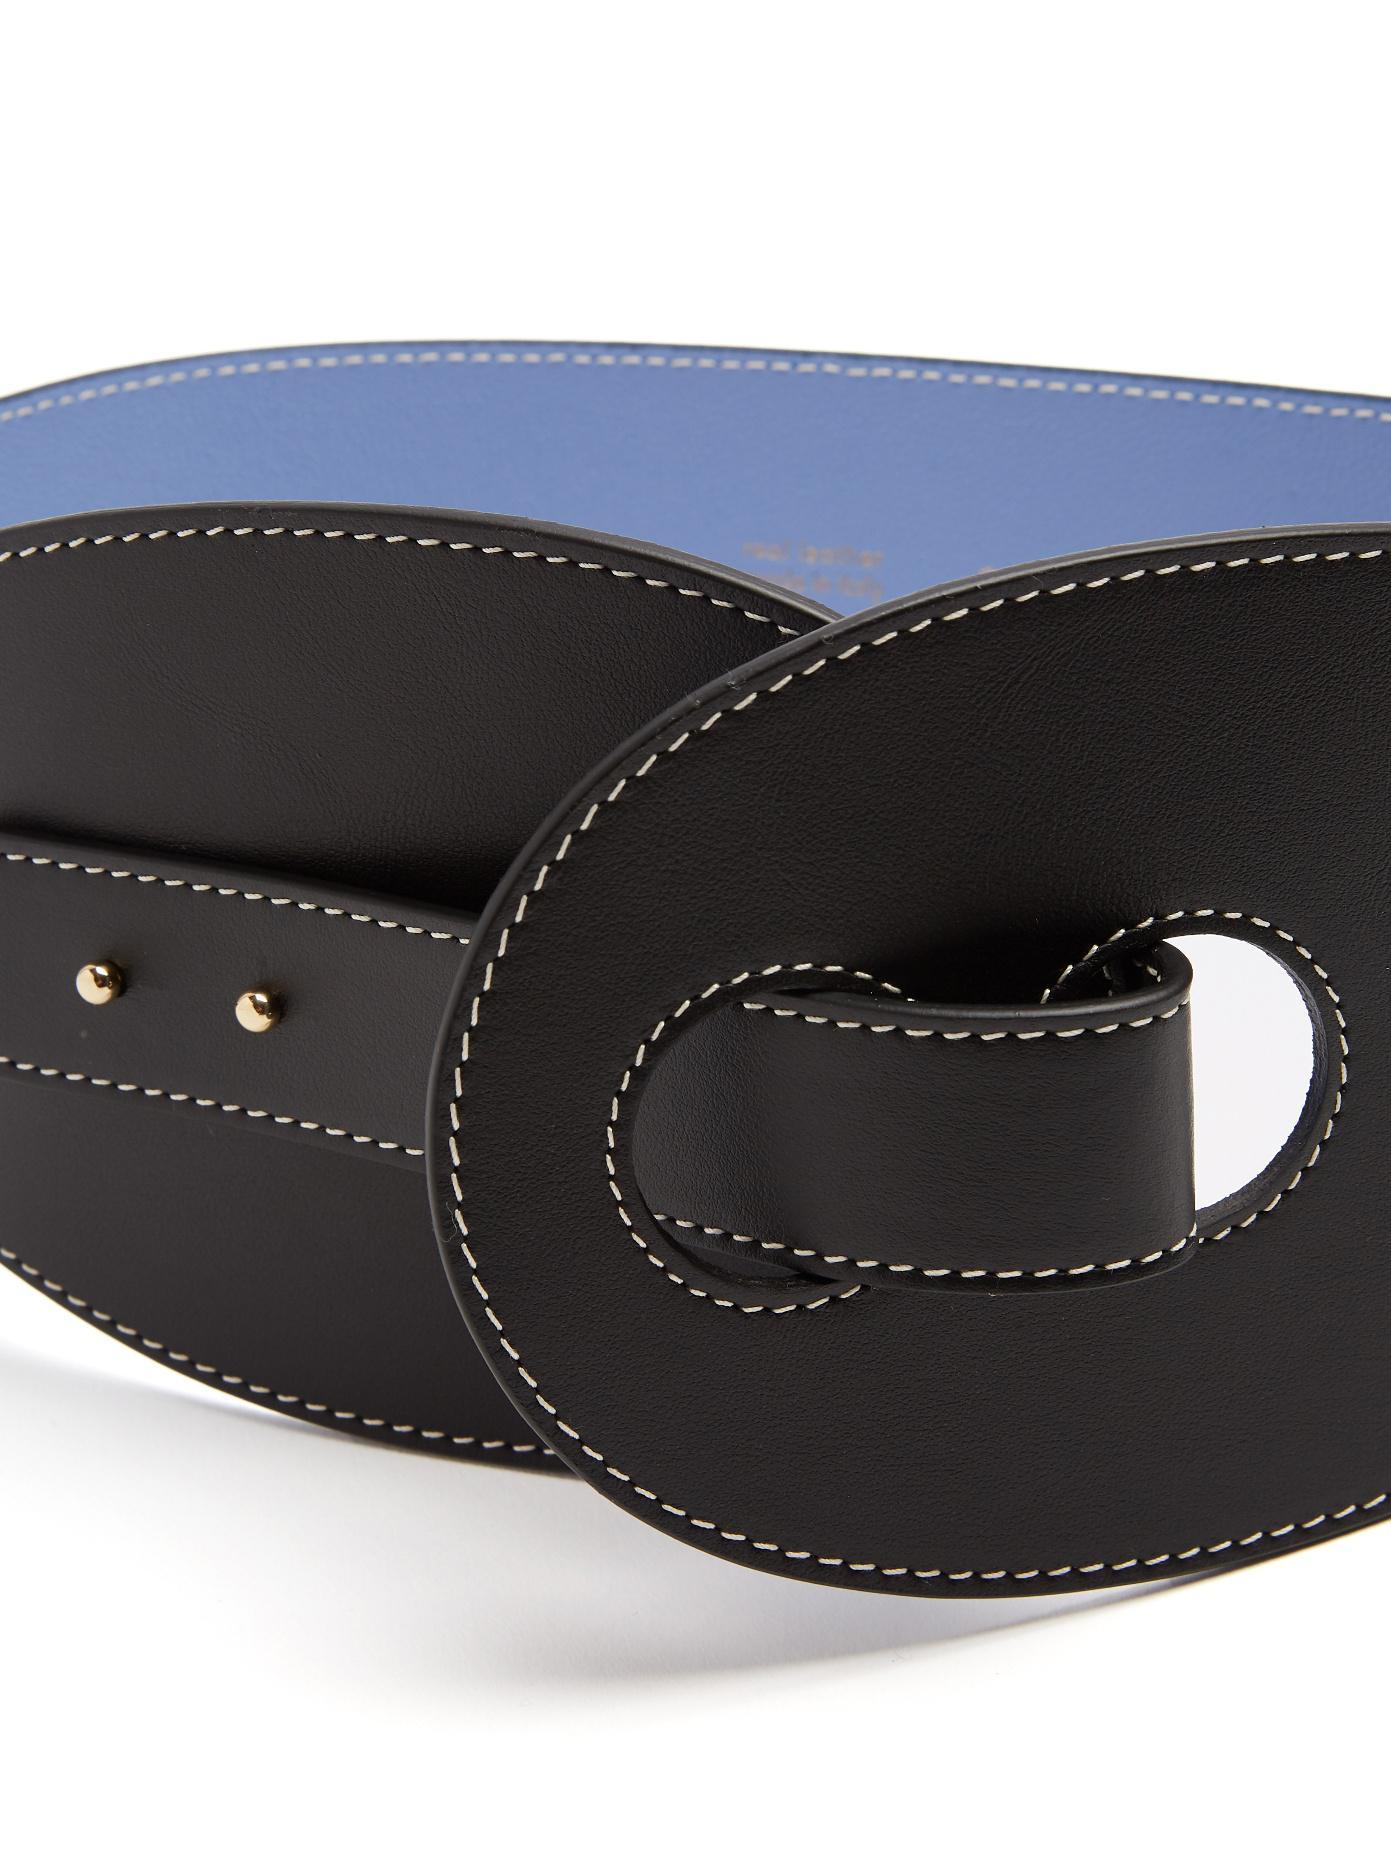 Contrast stitch leather waist belt Roksanda Ilincic 7TpyDax